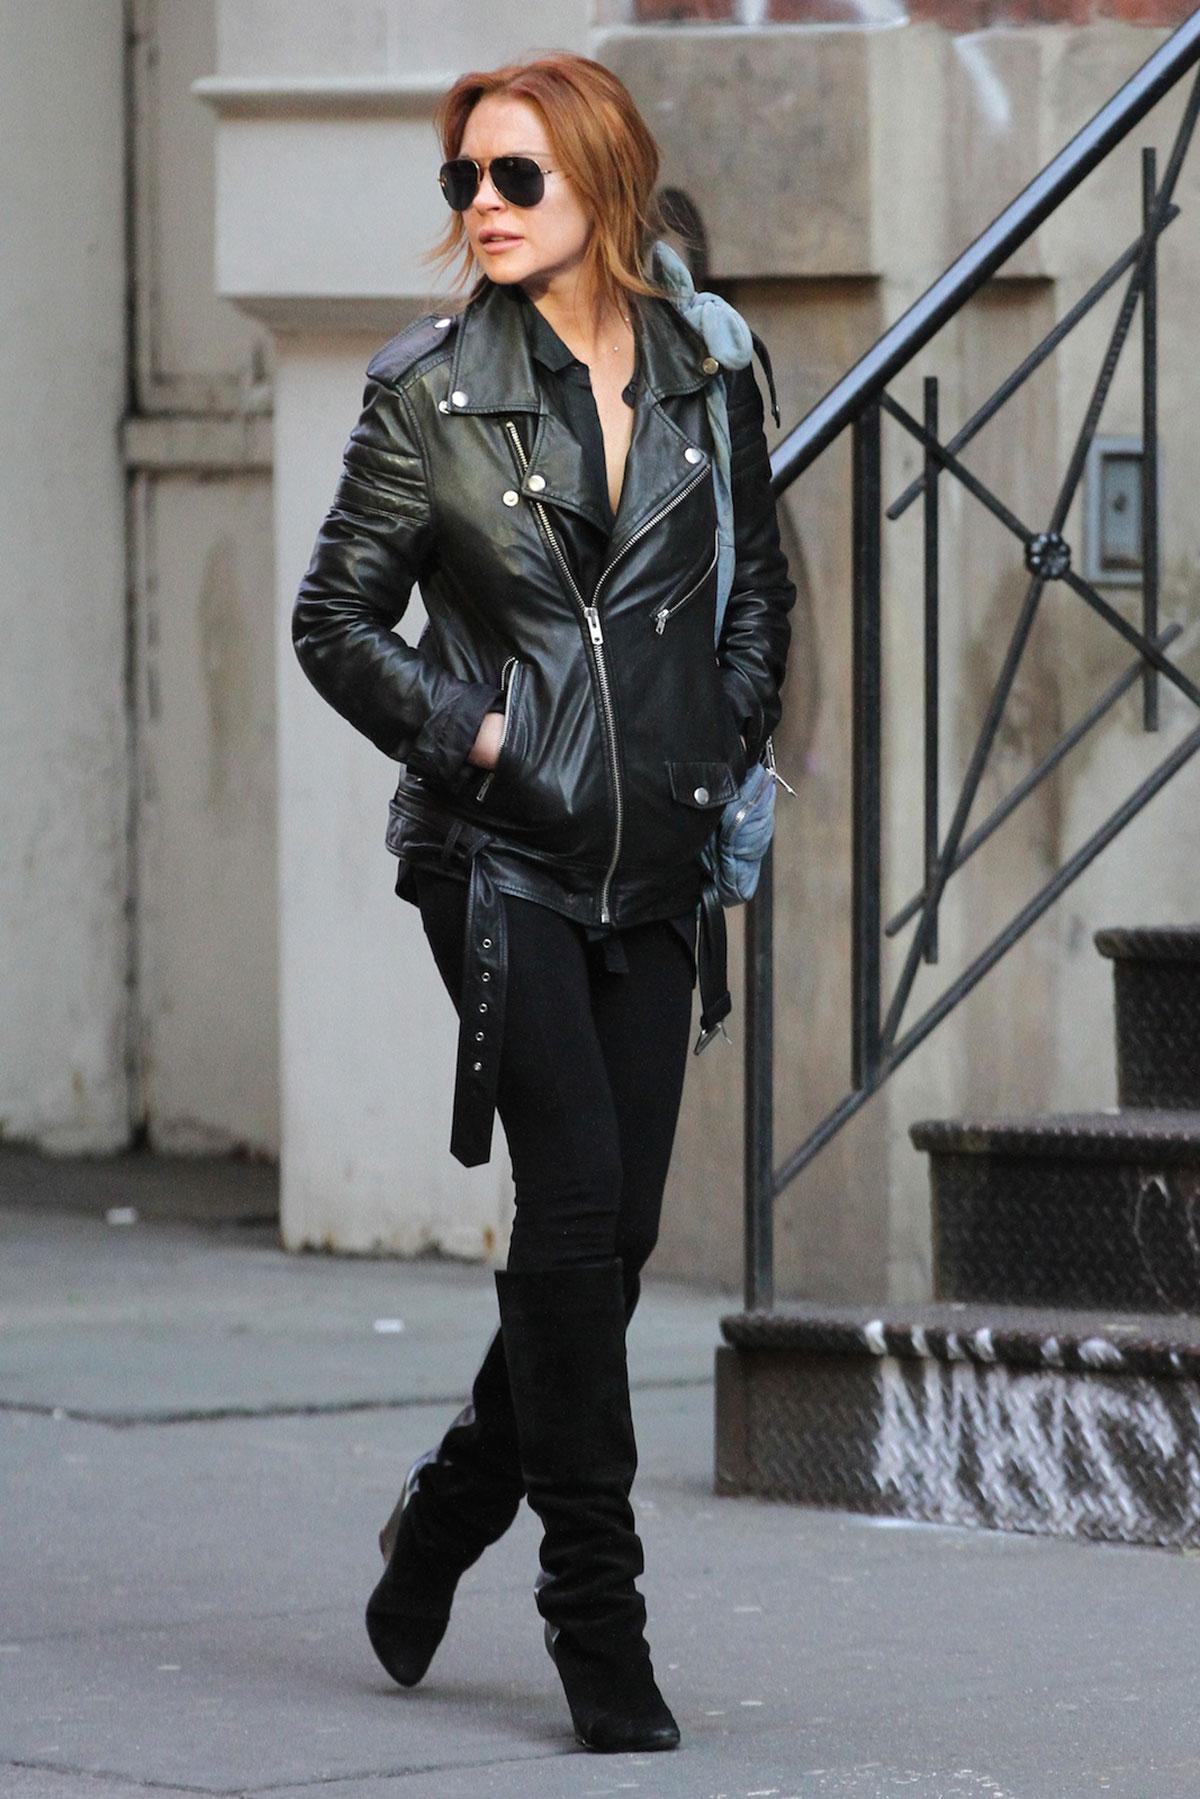 Lindsay Lohan strolled through SoHo